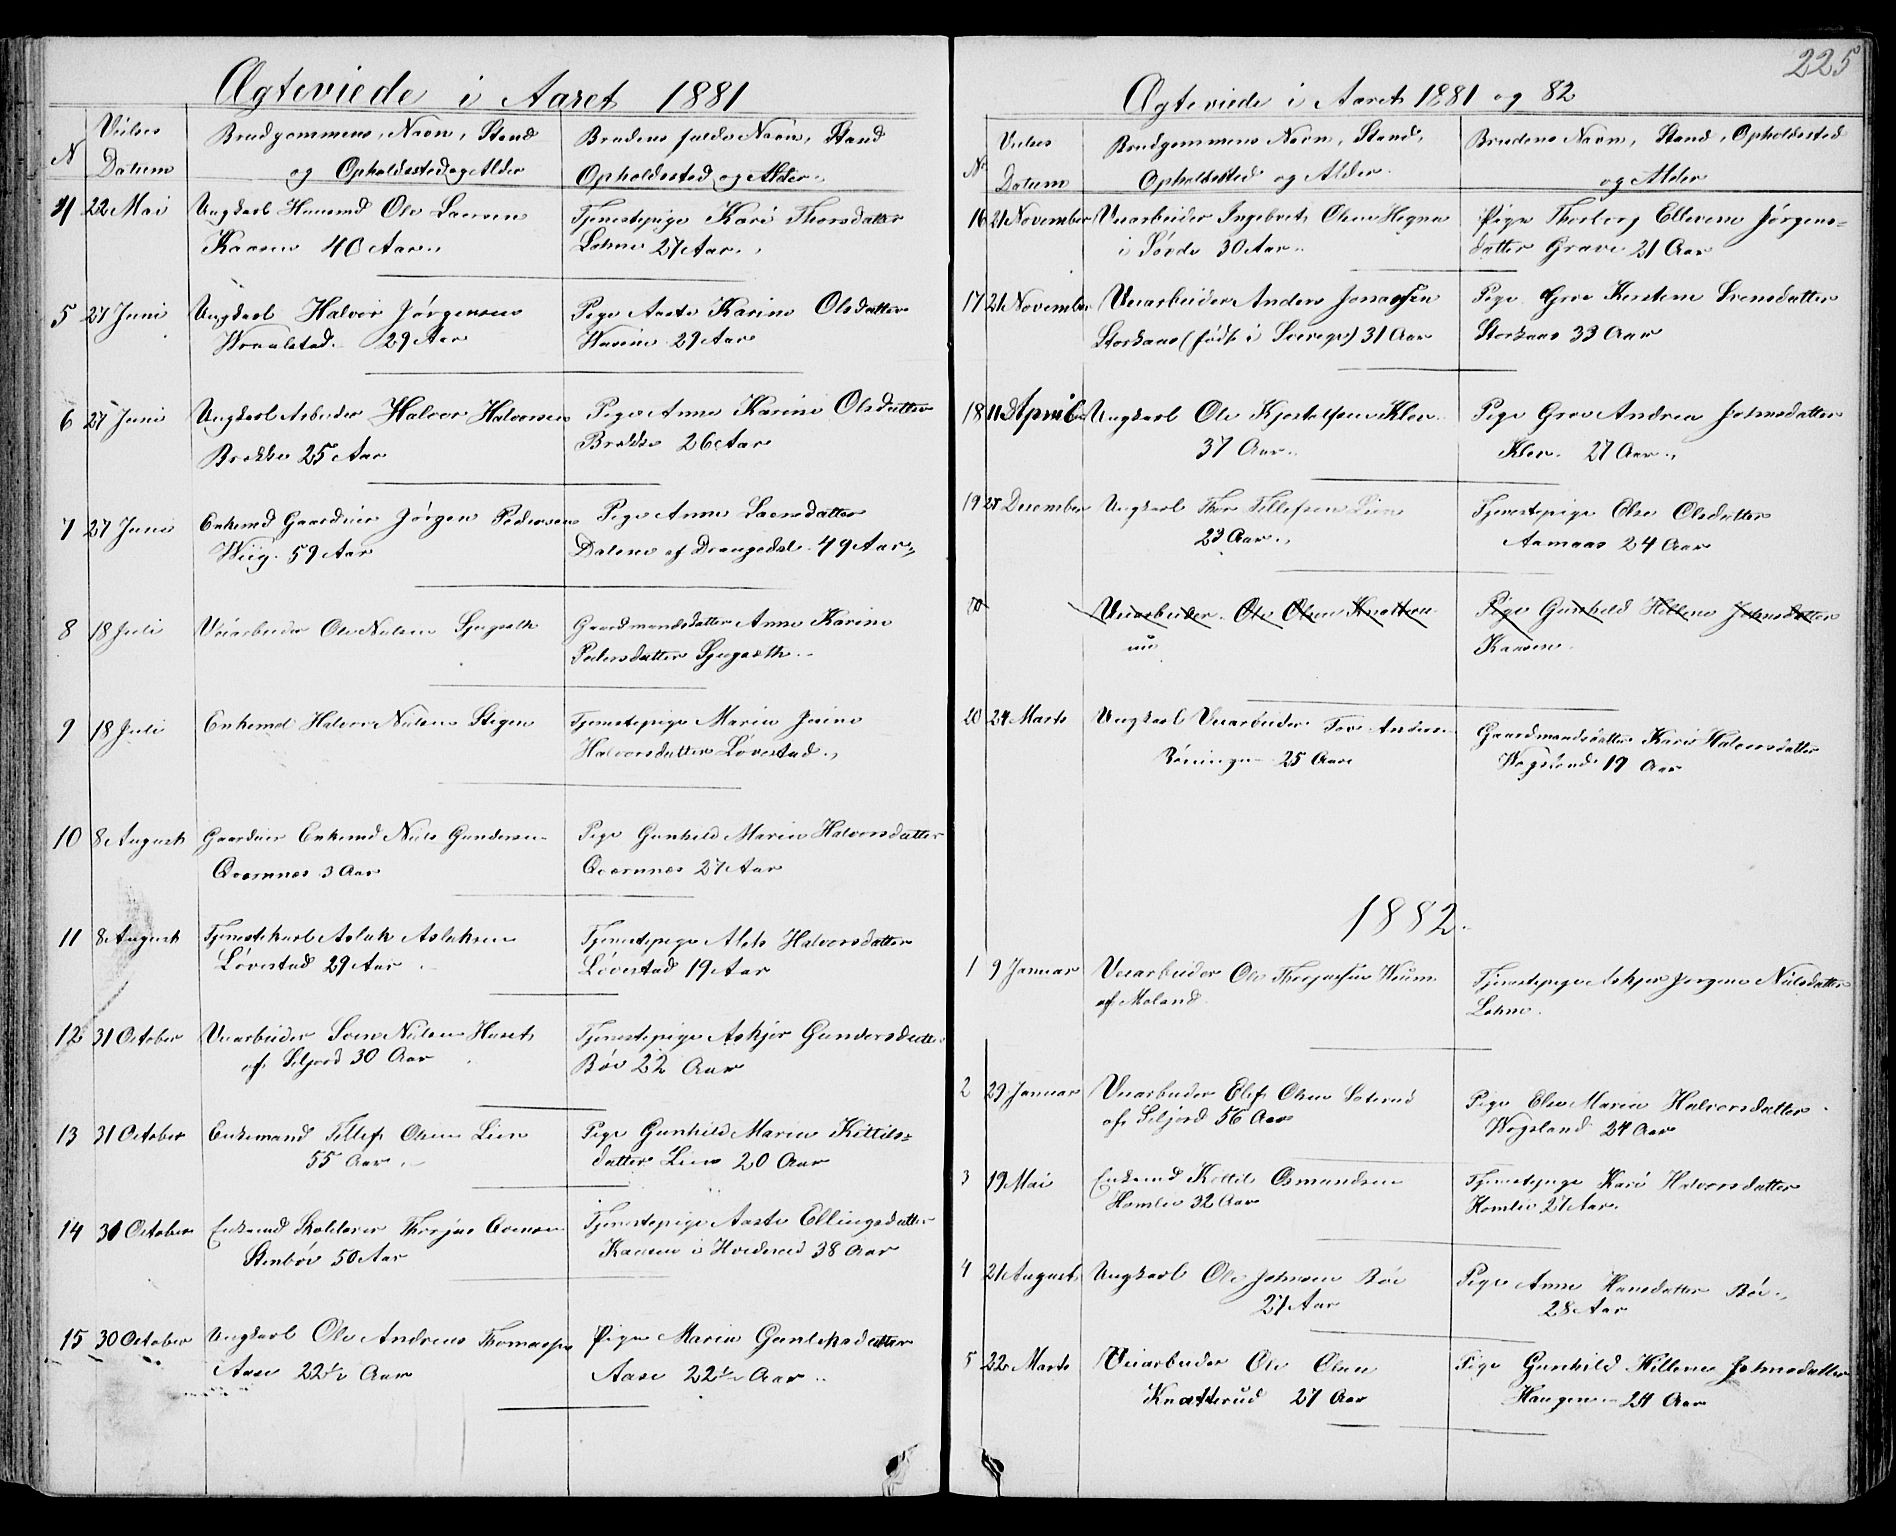 SAKO, Drangedal kirkebøker, G/Gb/L0001: Klokkerbok nr. II 1, 1856-1894, s. 225